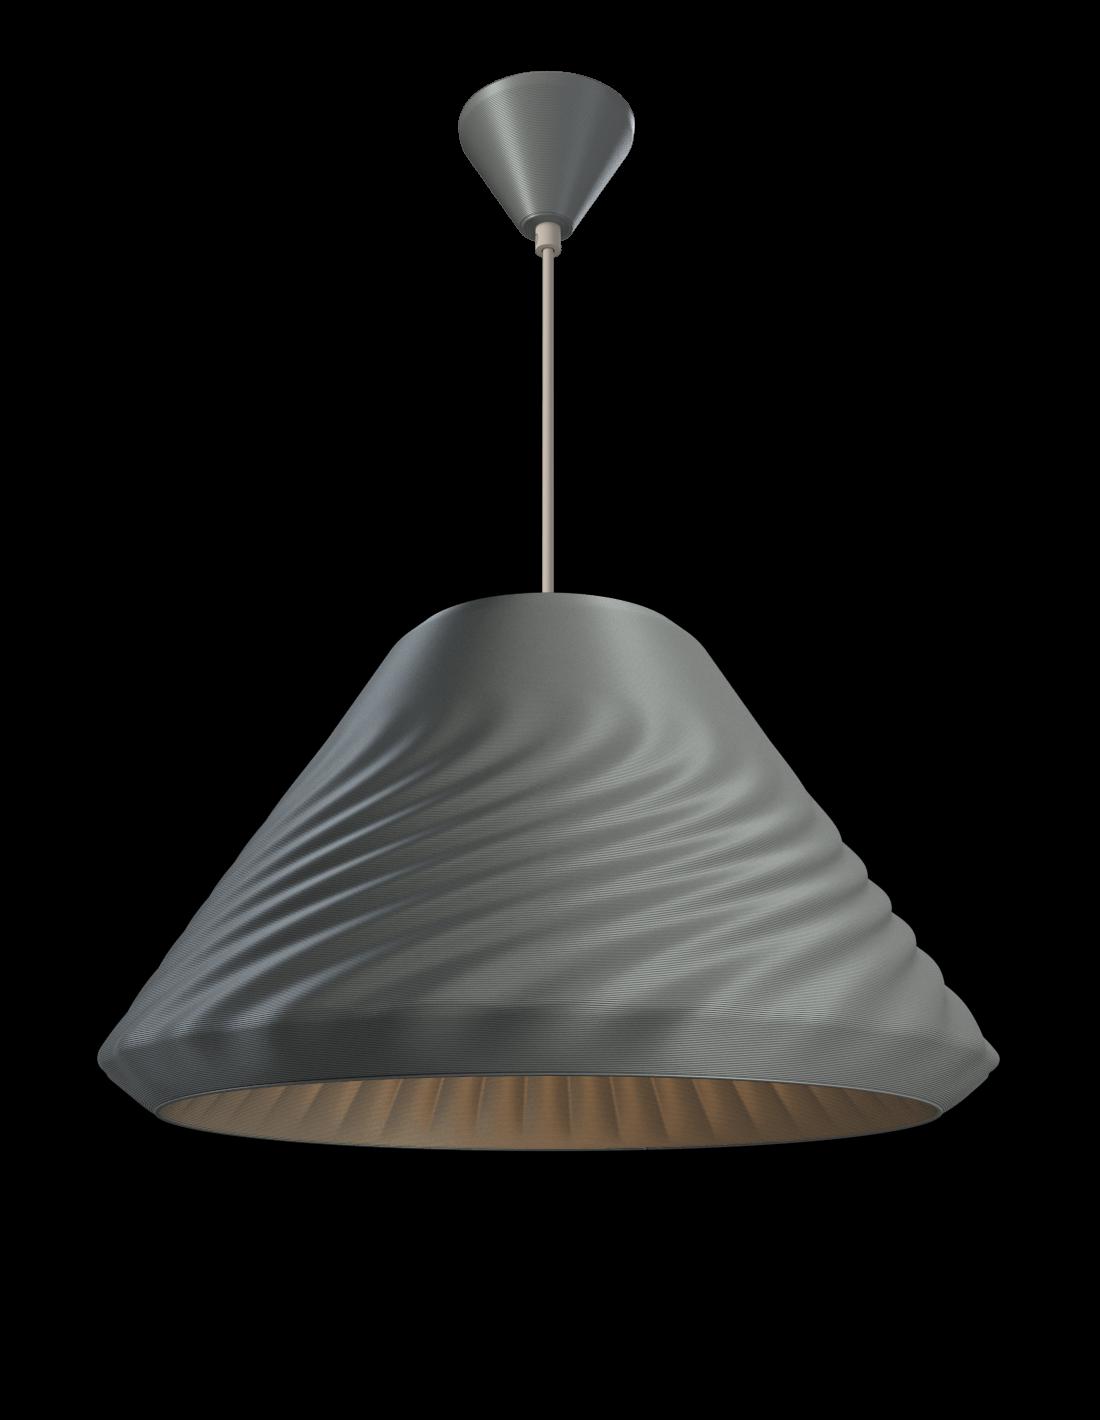 Double Cone Hanglamp Metallic blue